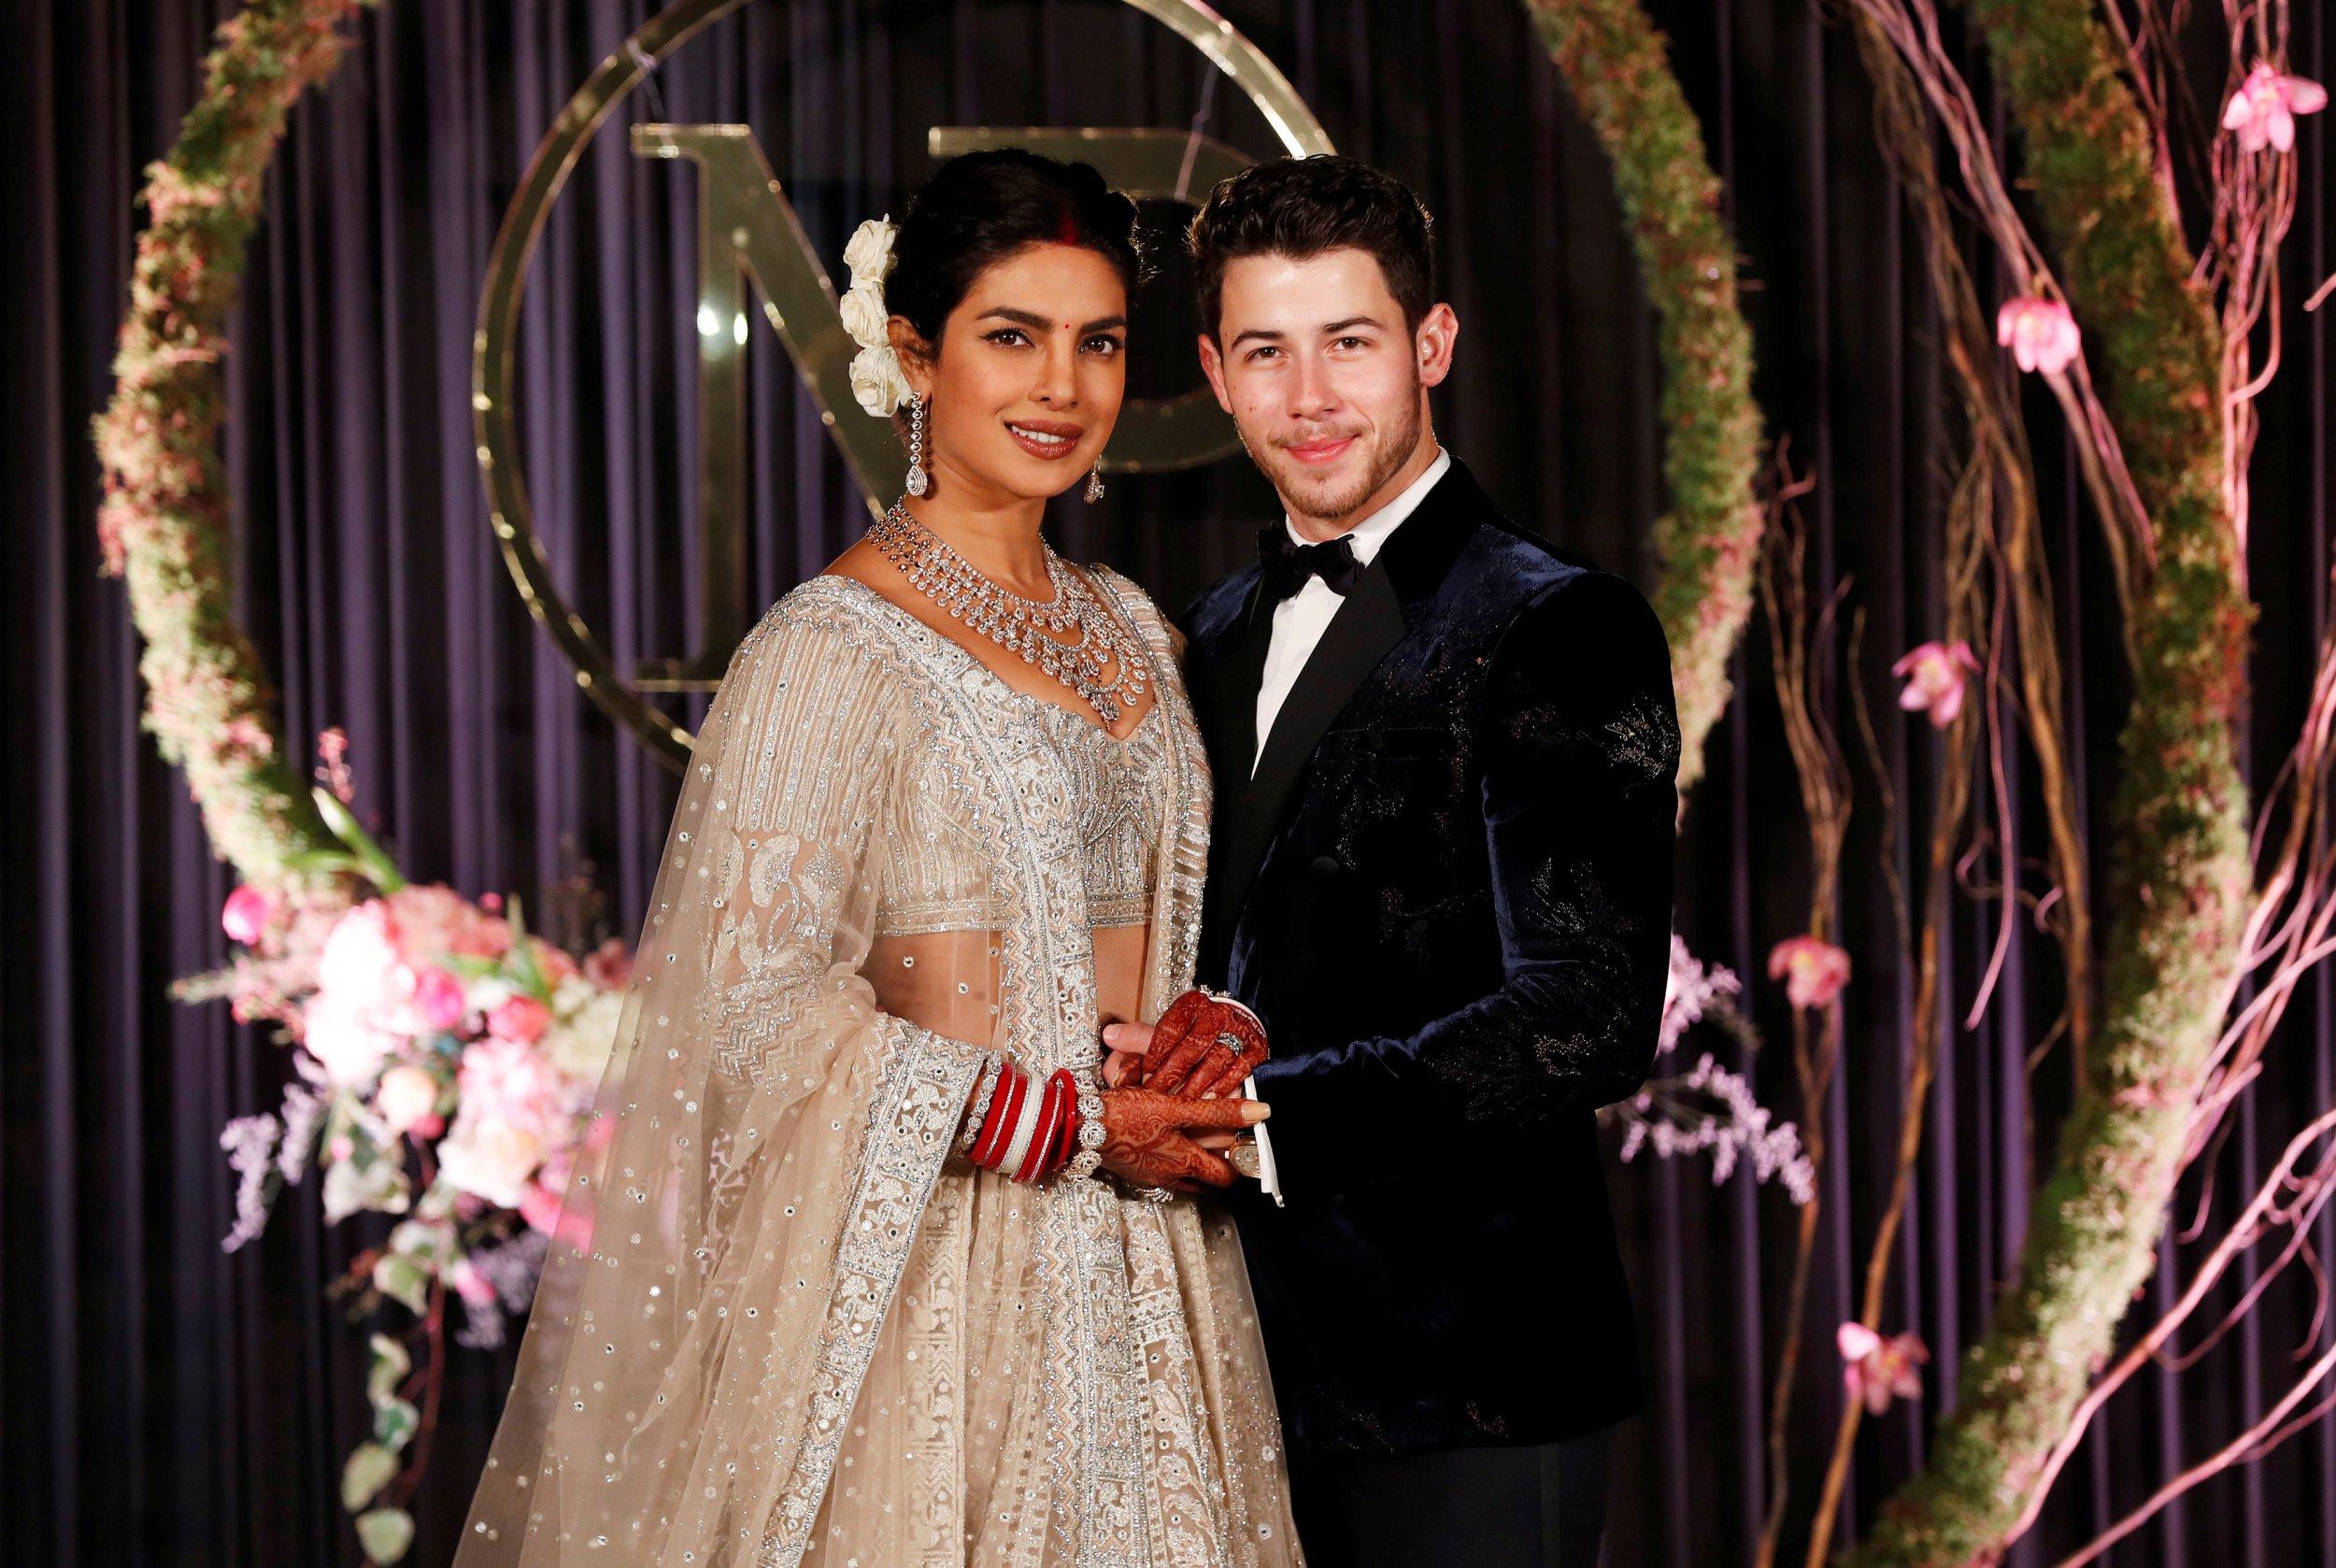 Nick Jonas opens up about baby plans with Priyanka Chopra days after lavish wedding